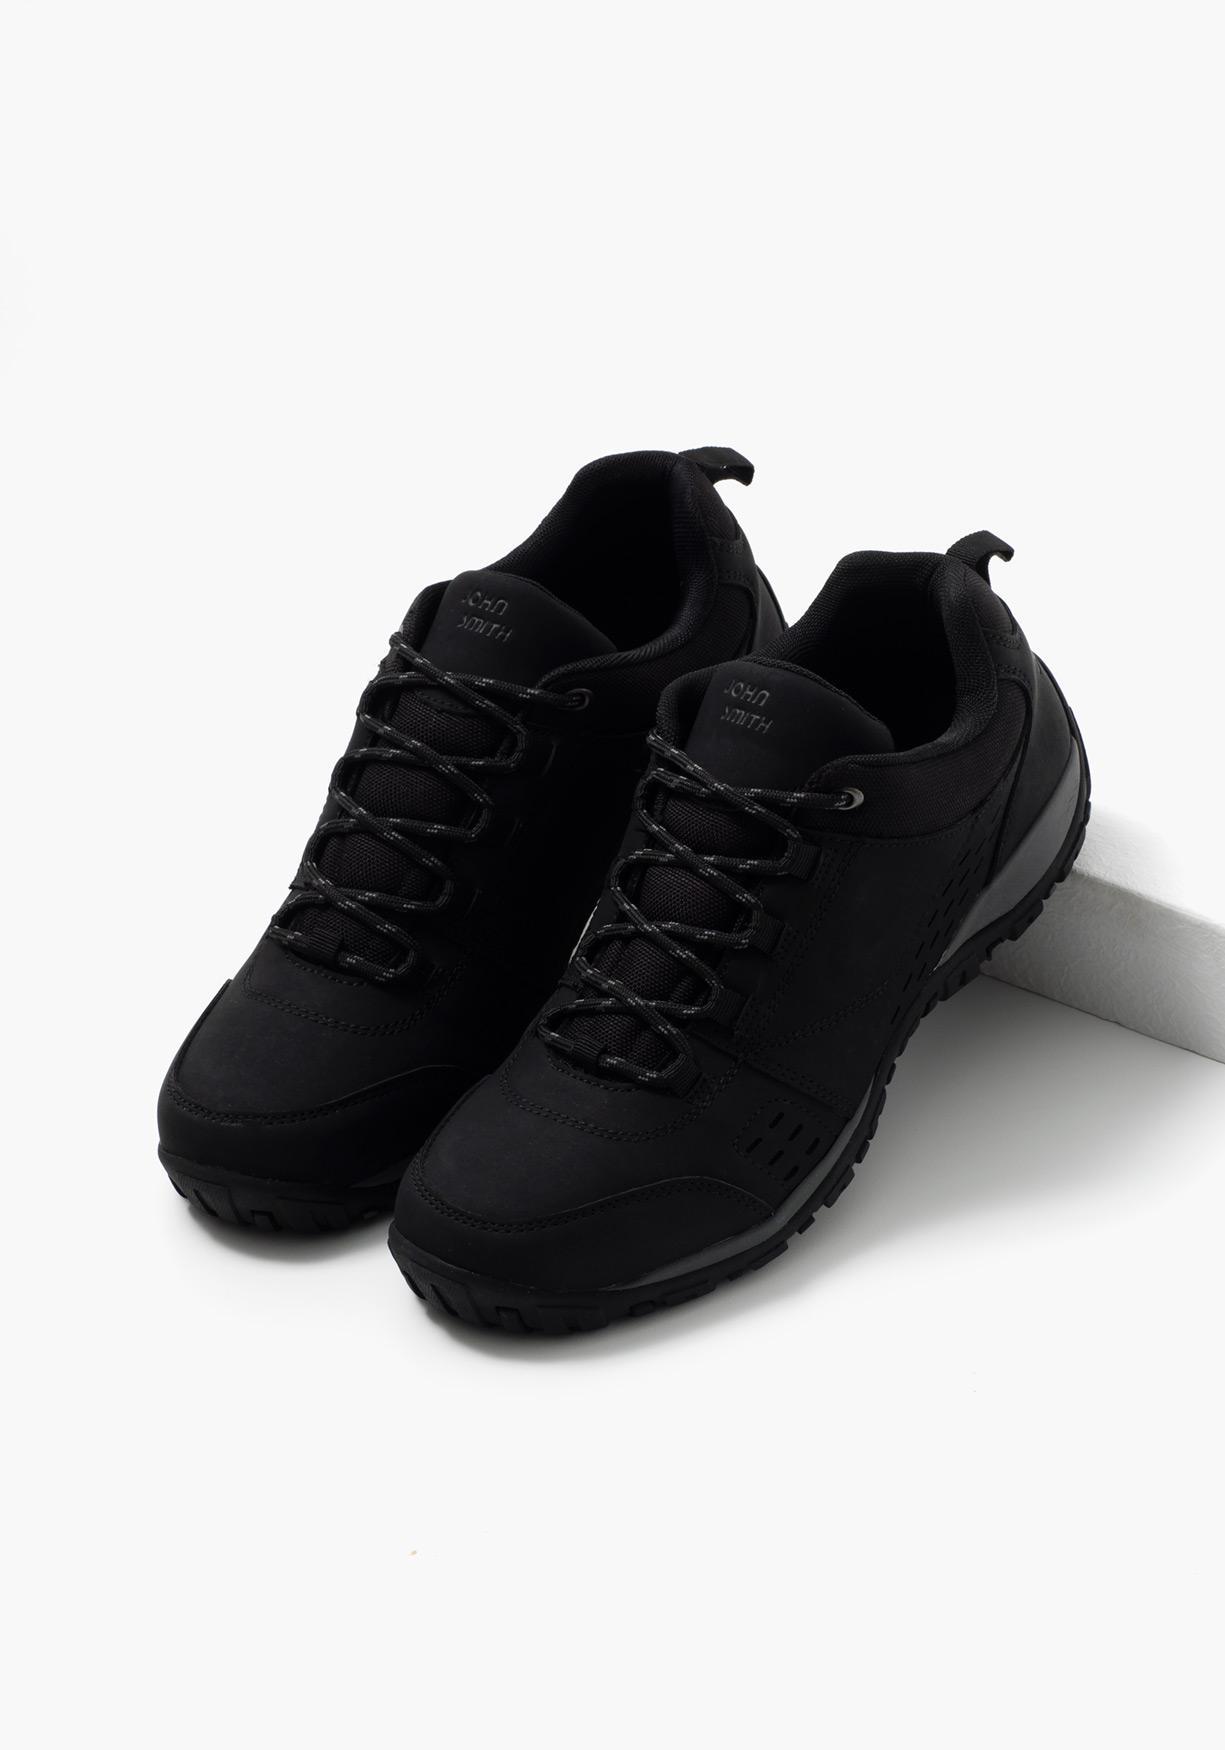 e90caf3a Comprar Zapatos De Deportivos John Smith¡aprovéchate Nuestros N8mn0w